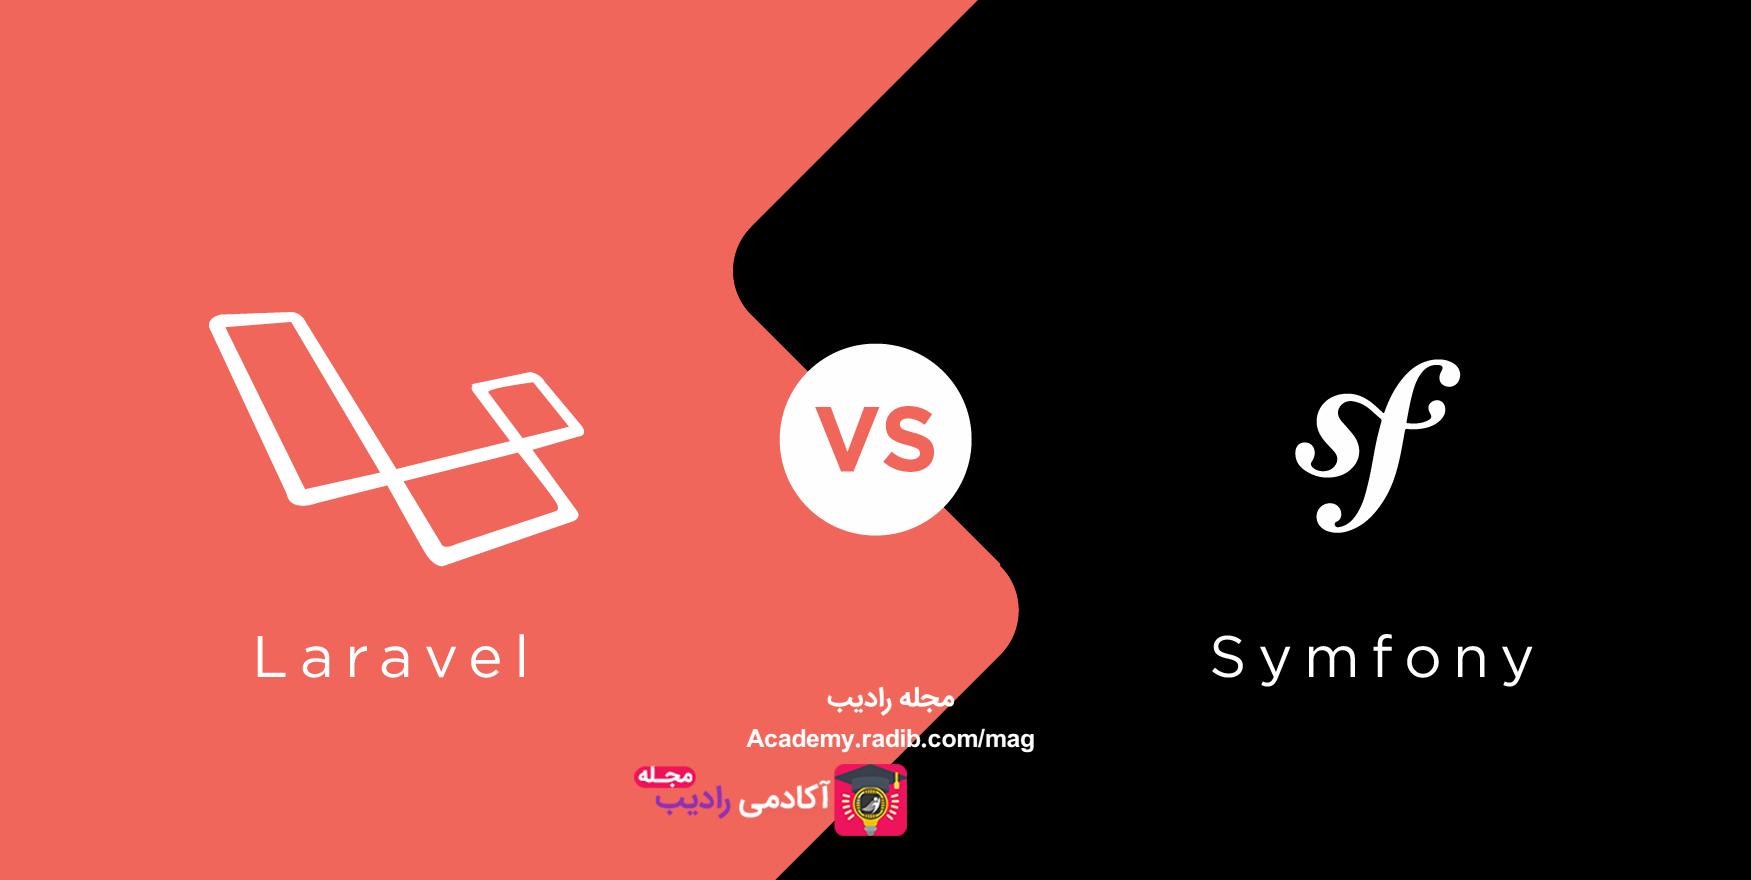 سیمفونی یا لاراول - مقایسه laravel و symfony